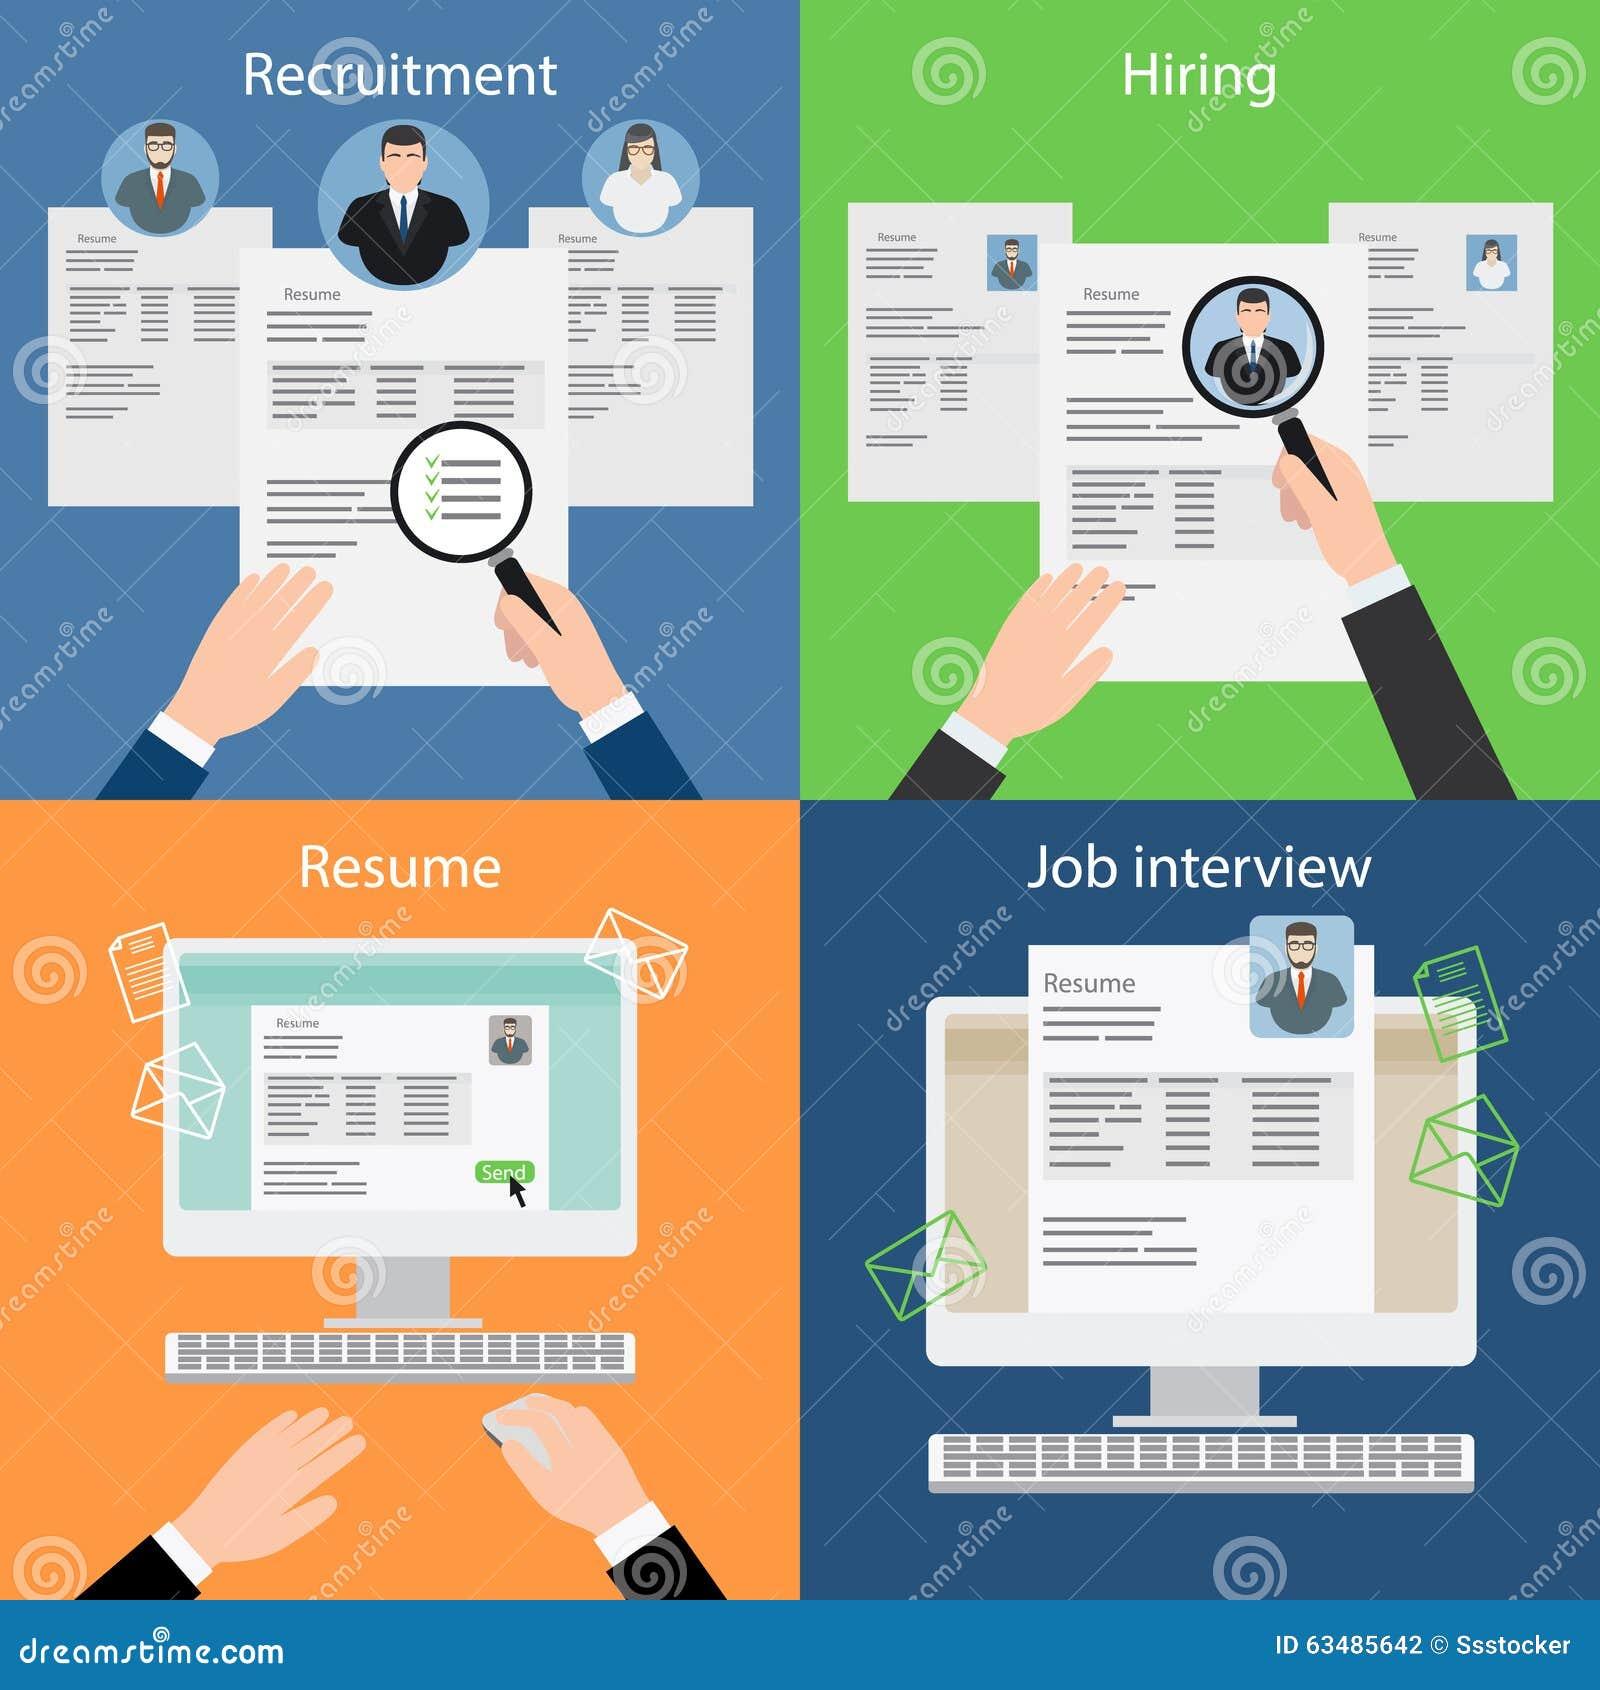 recruitment and job